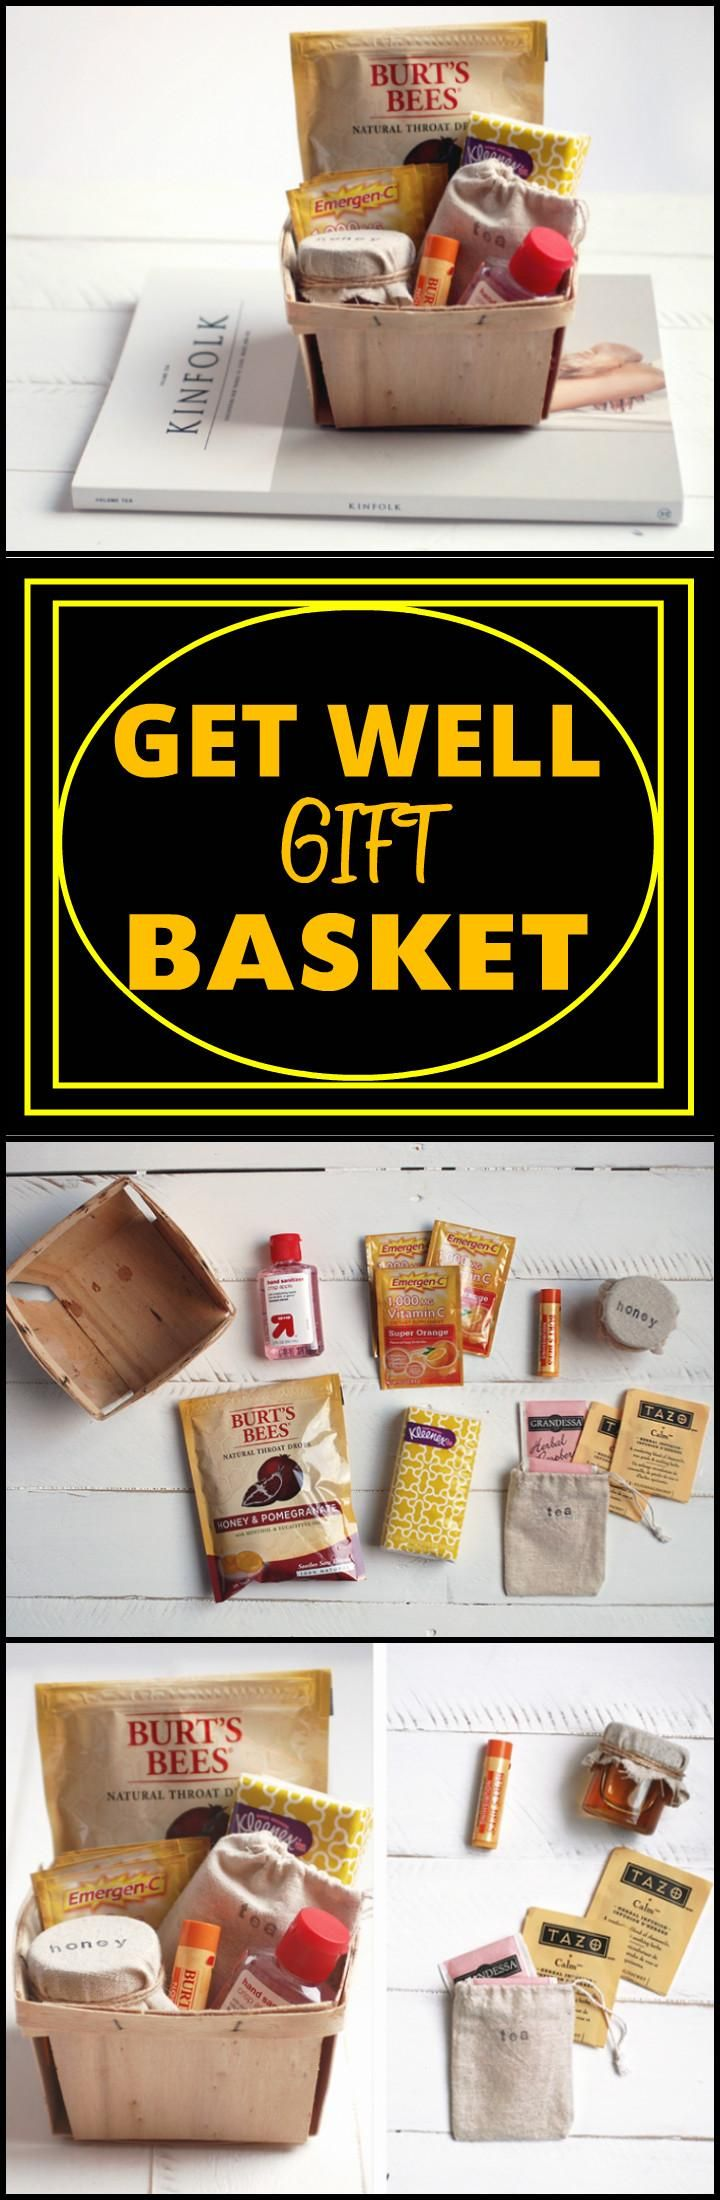 70+ Inexpensive DIY Gift Basket Ideas - DIY Gifts - Page 9 of 14 - DIY & Crafts